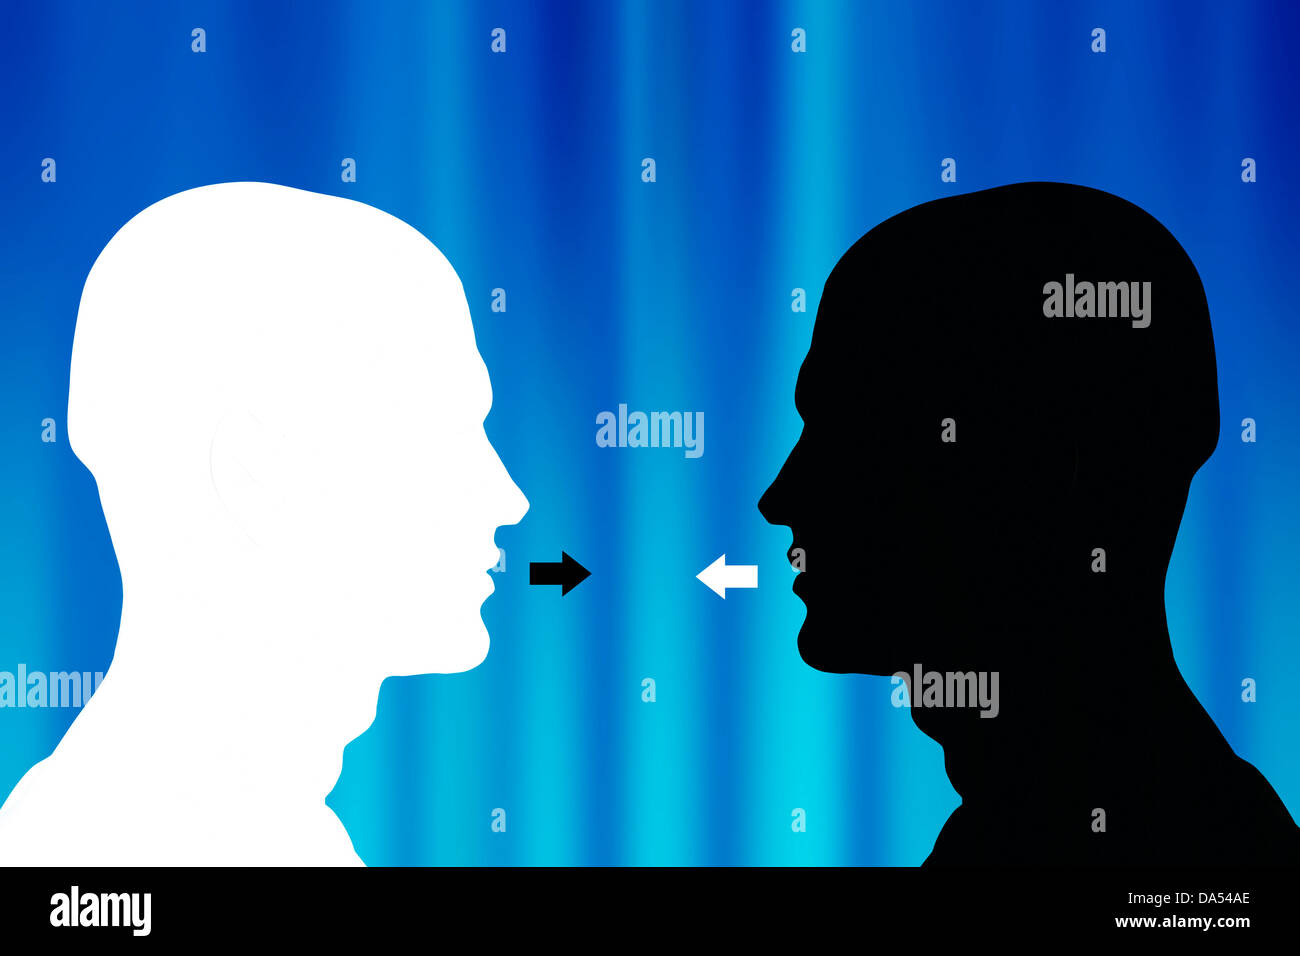 La contraposición de dos varones cabezas silueta uno frente a otro - concepto de comunicación Imagen De Stock